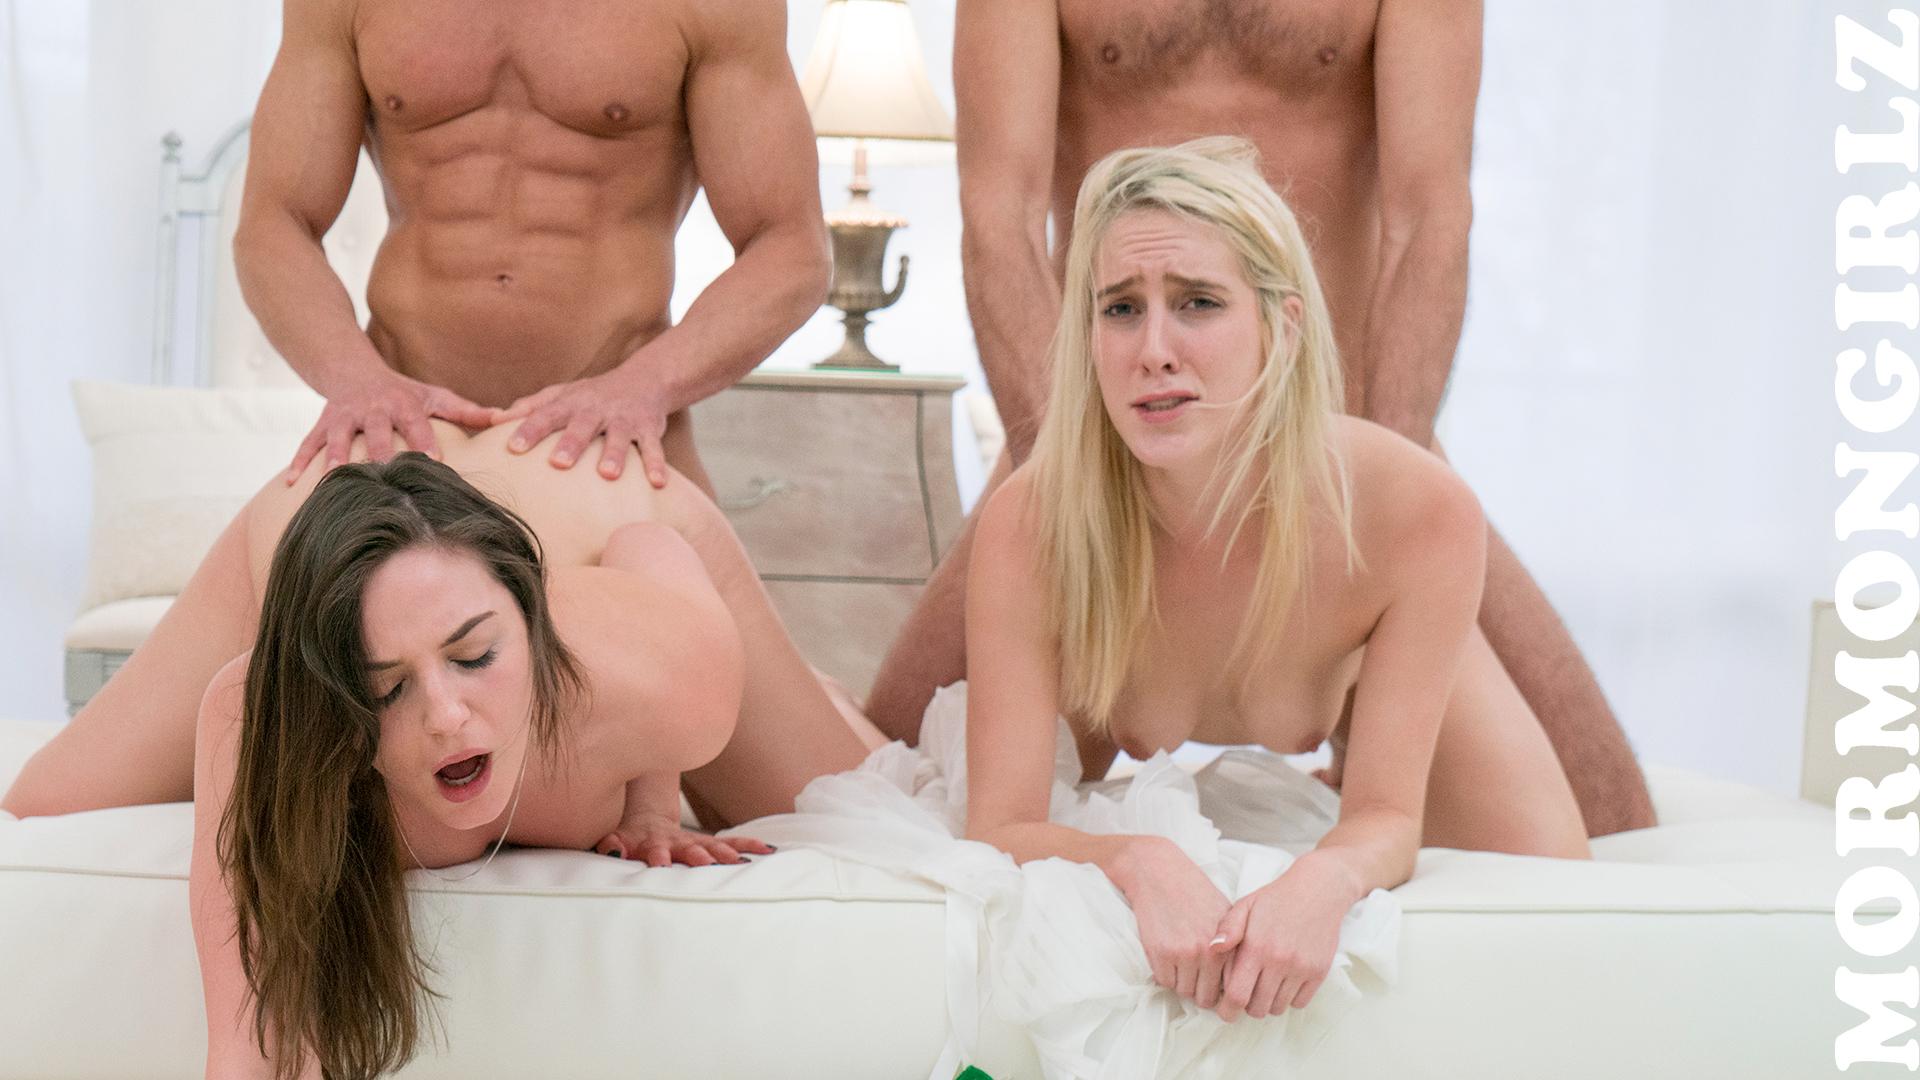 Teen mormon sex video — img 10